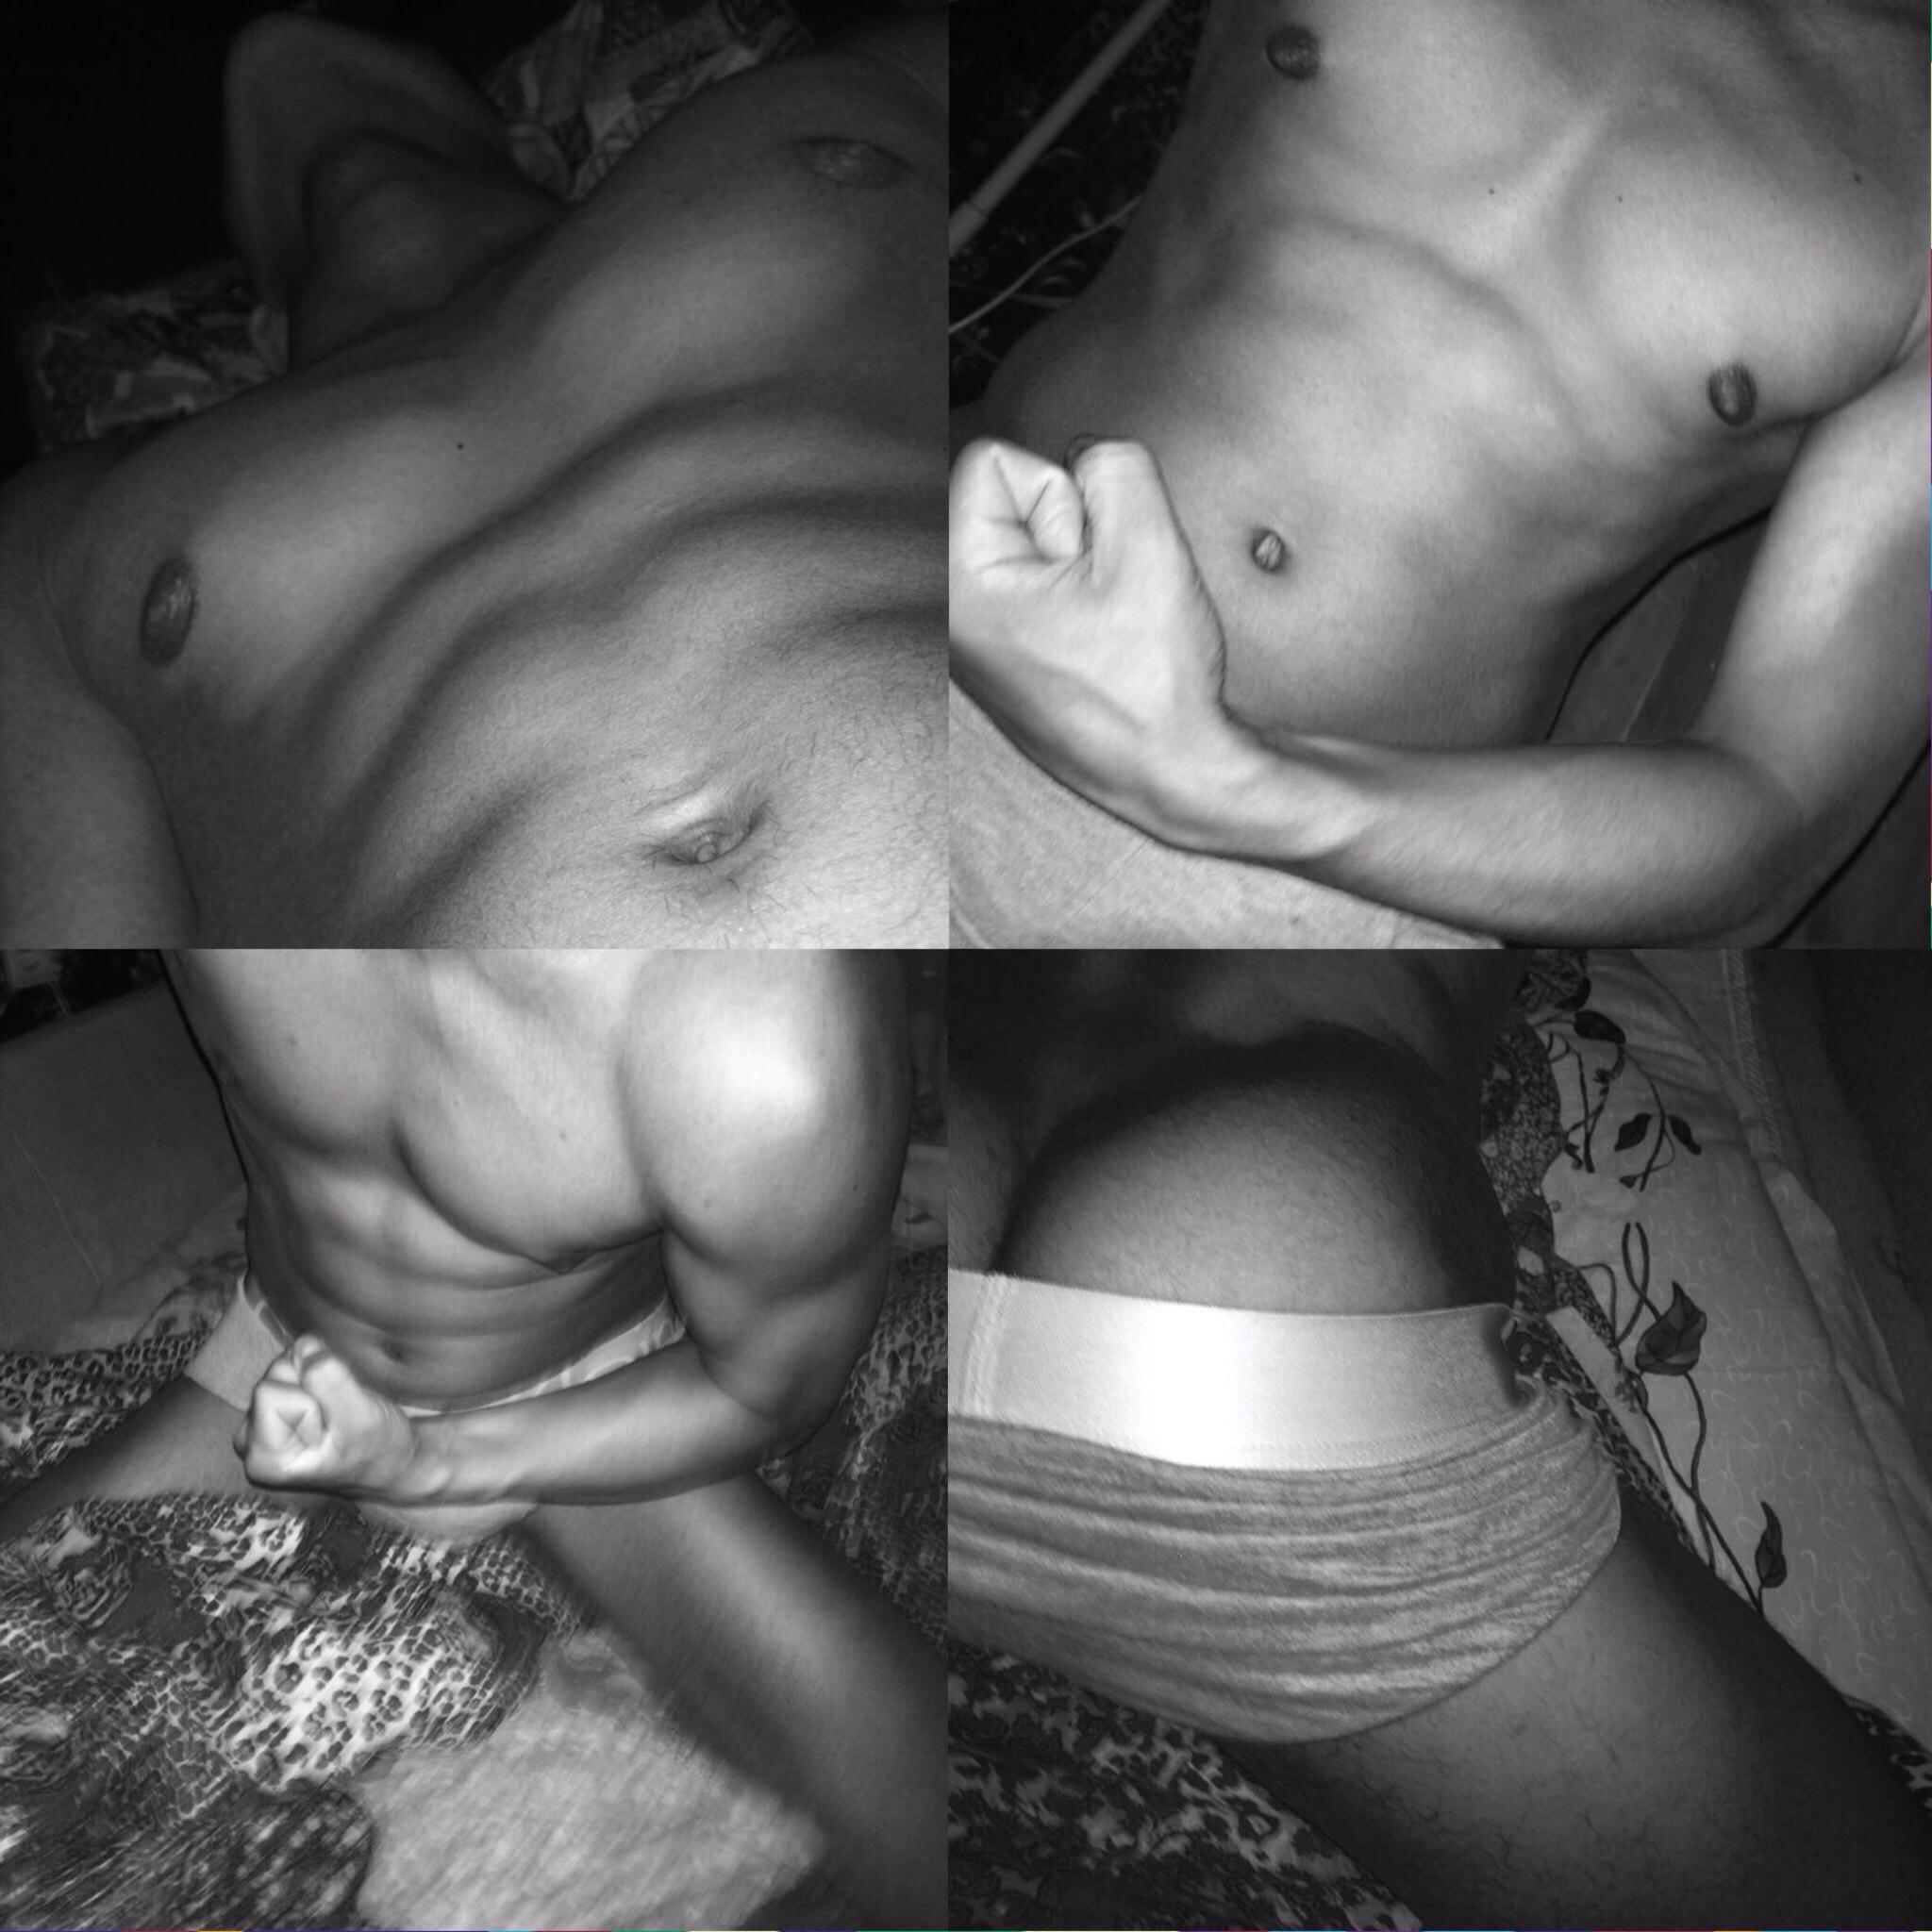 Снкс порно фото 6 фотография